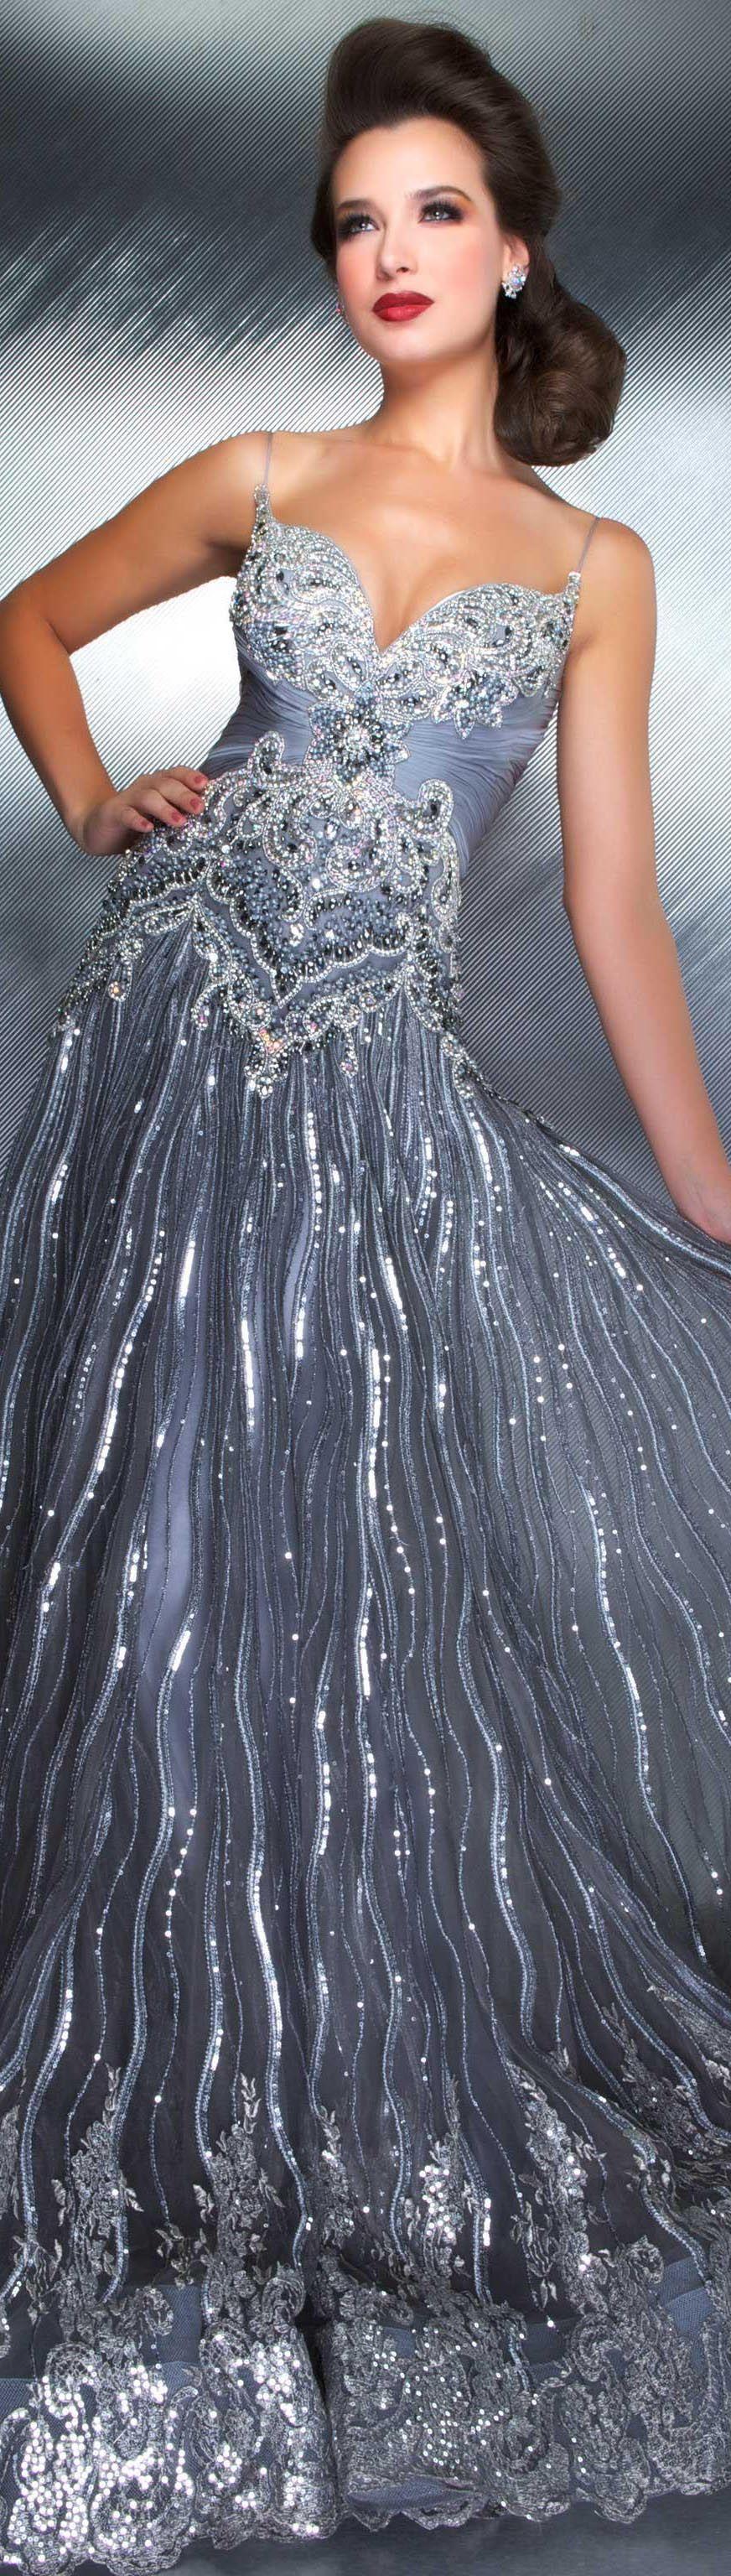 Mac duggal couture dress smoke glitter long formal dress couture